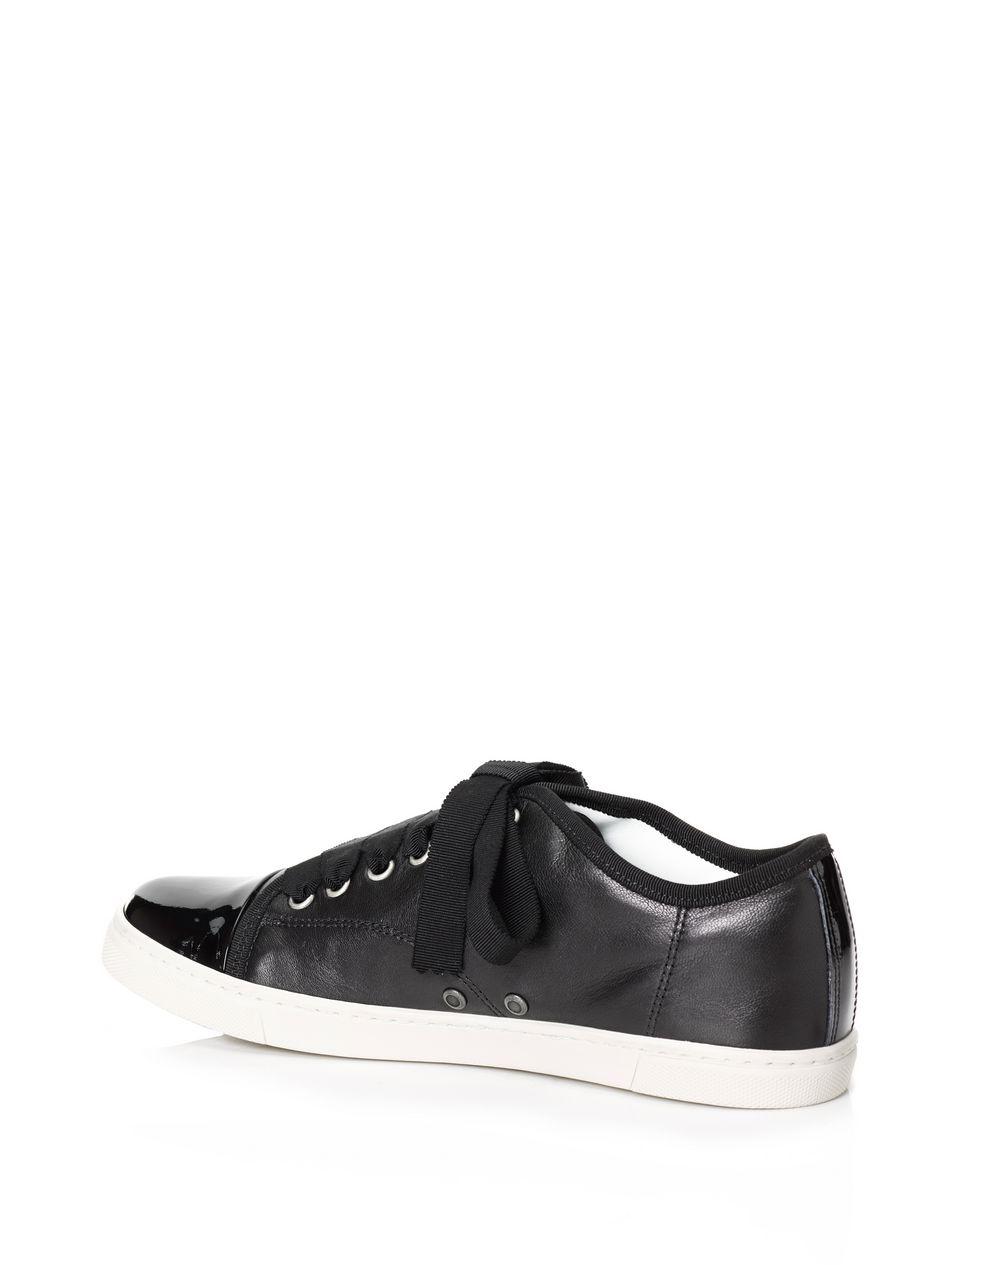 Low-top sneakers - Lanvin